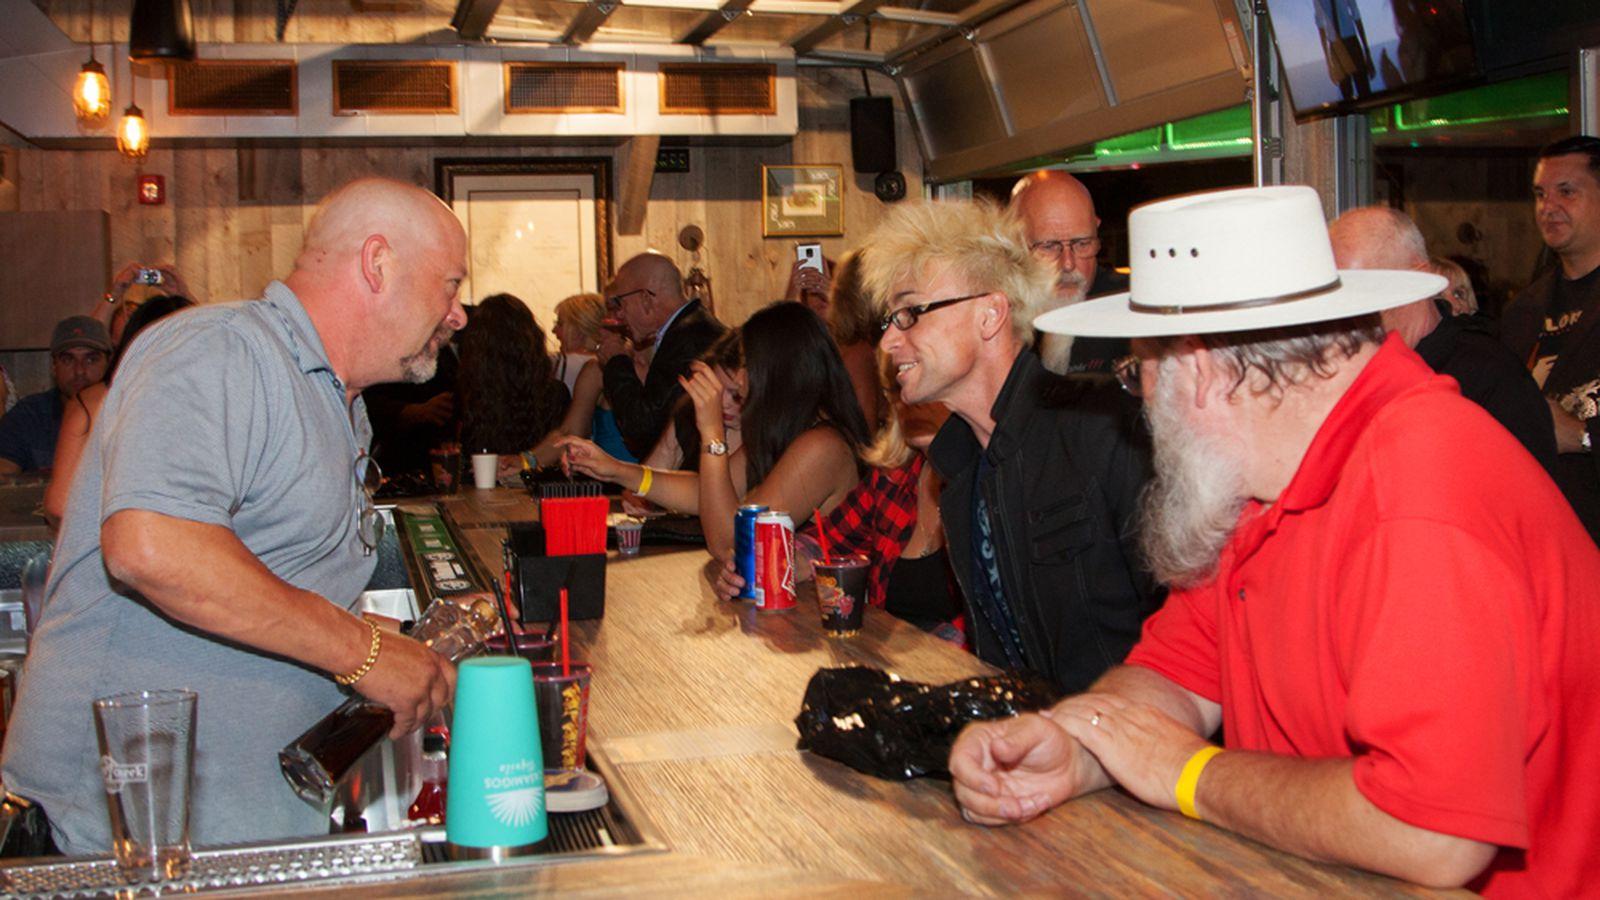 Pawn Shop Austin >> Drink the 'Old Man' at Rick's Rollin Smoke BBQ & Tavern ...